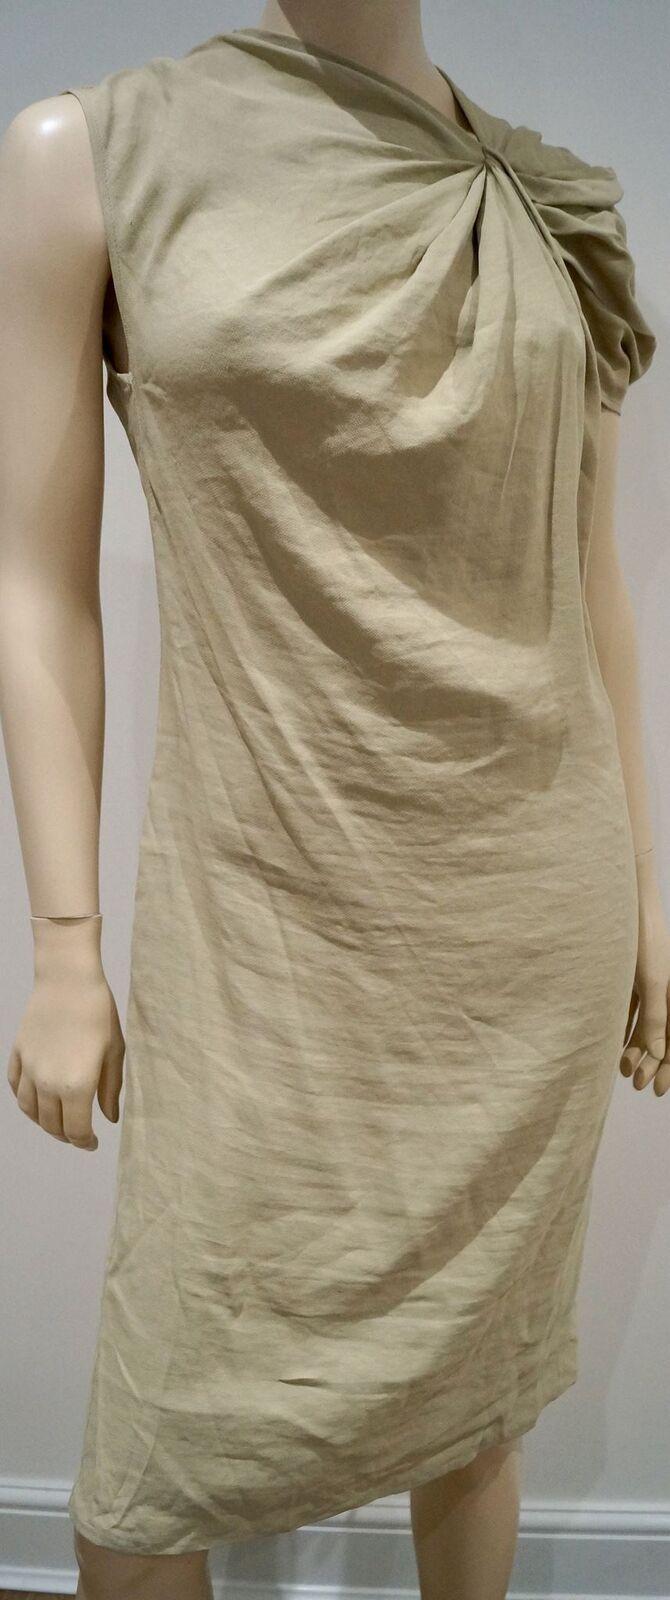 LANVIN ETE 2010 Beige Linen Blend Pleated Shoulder Summer Tunic Dress 44 UK16